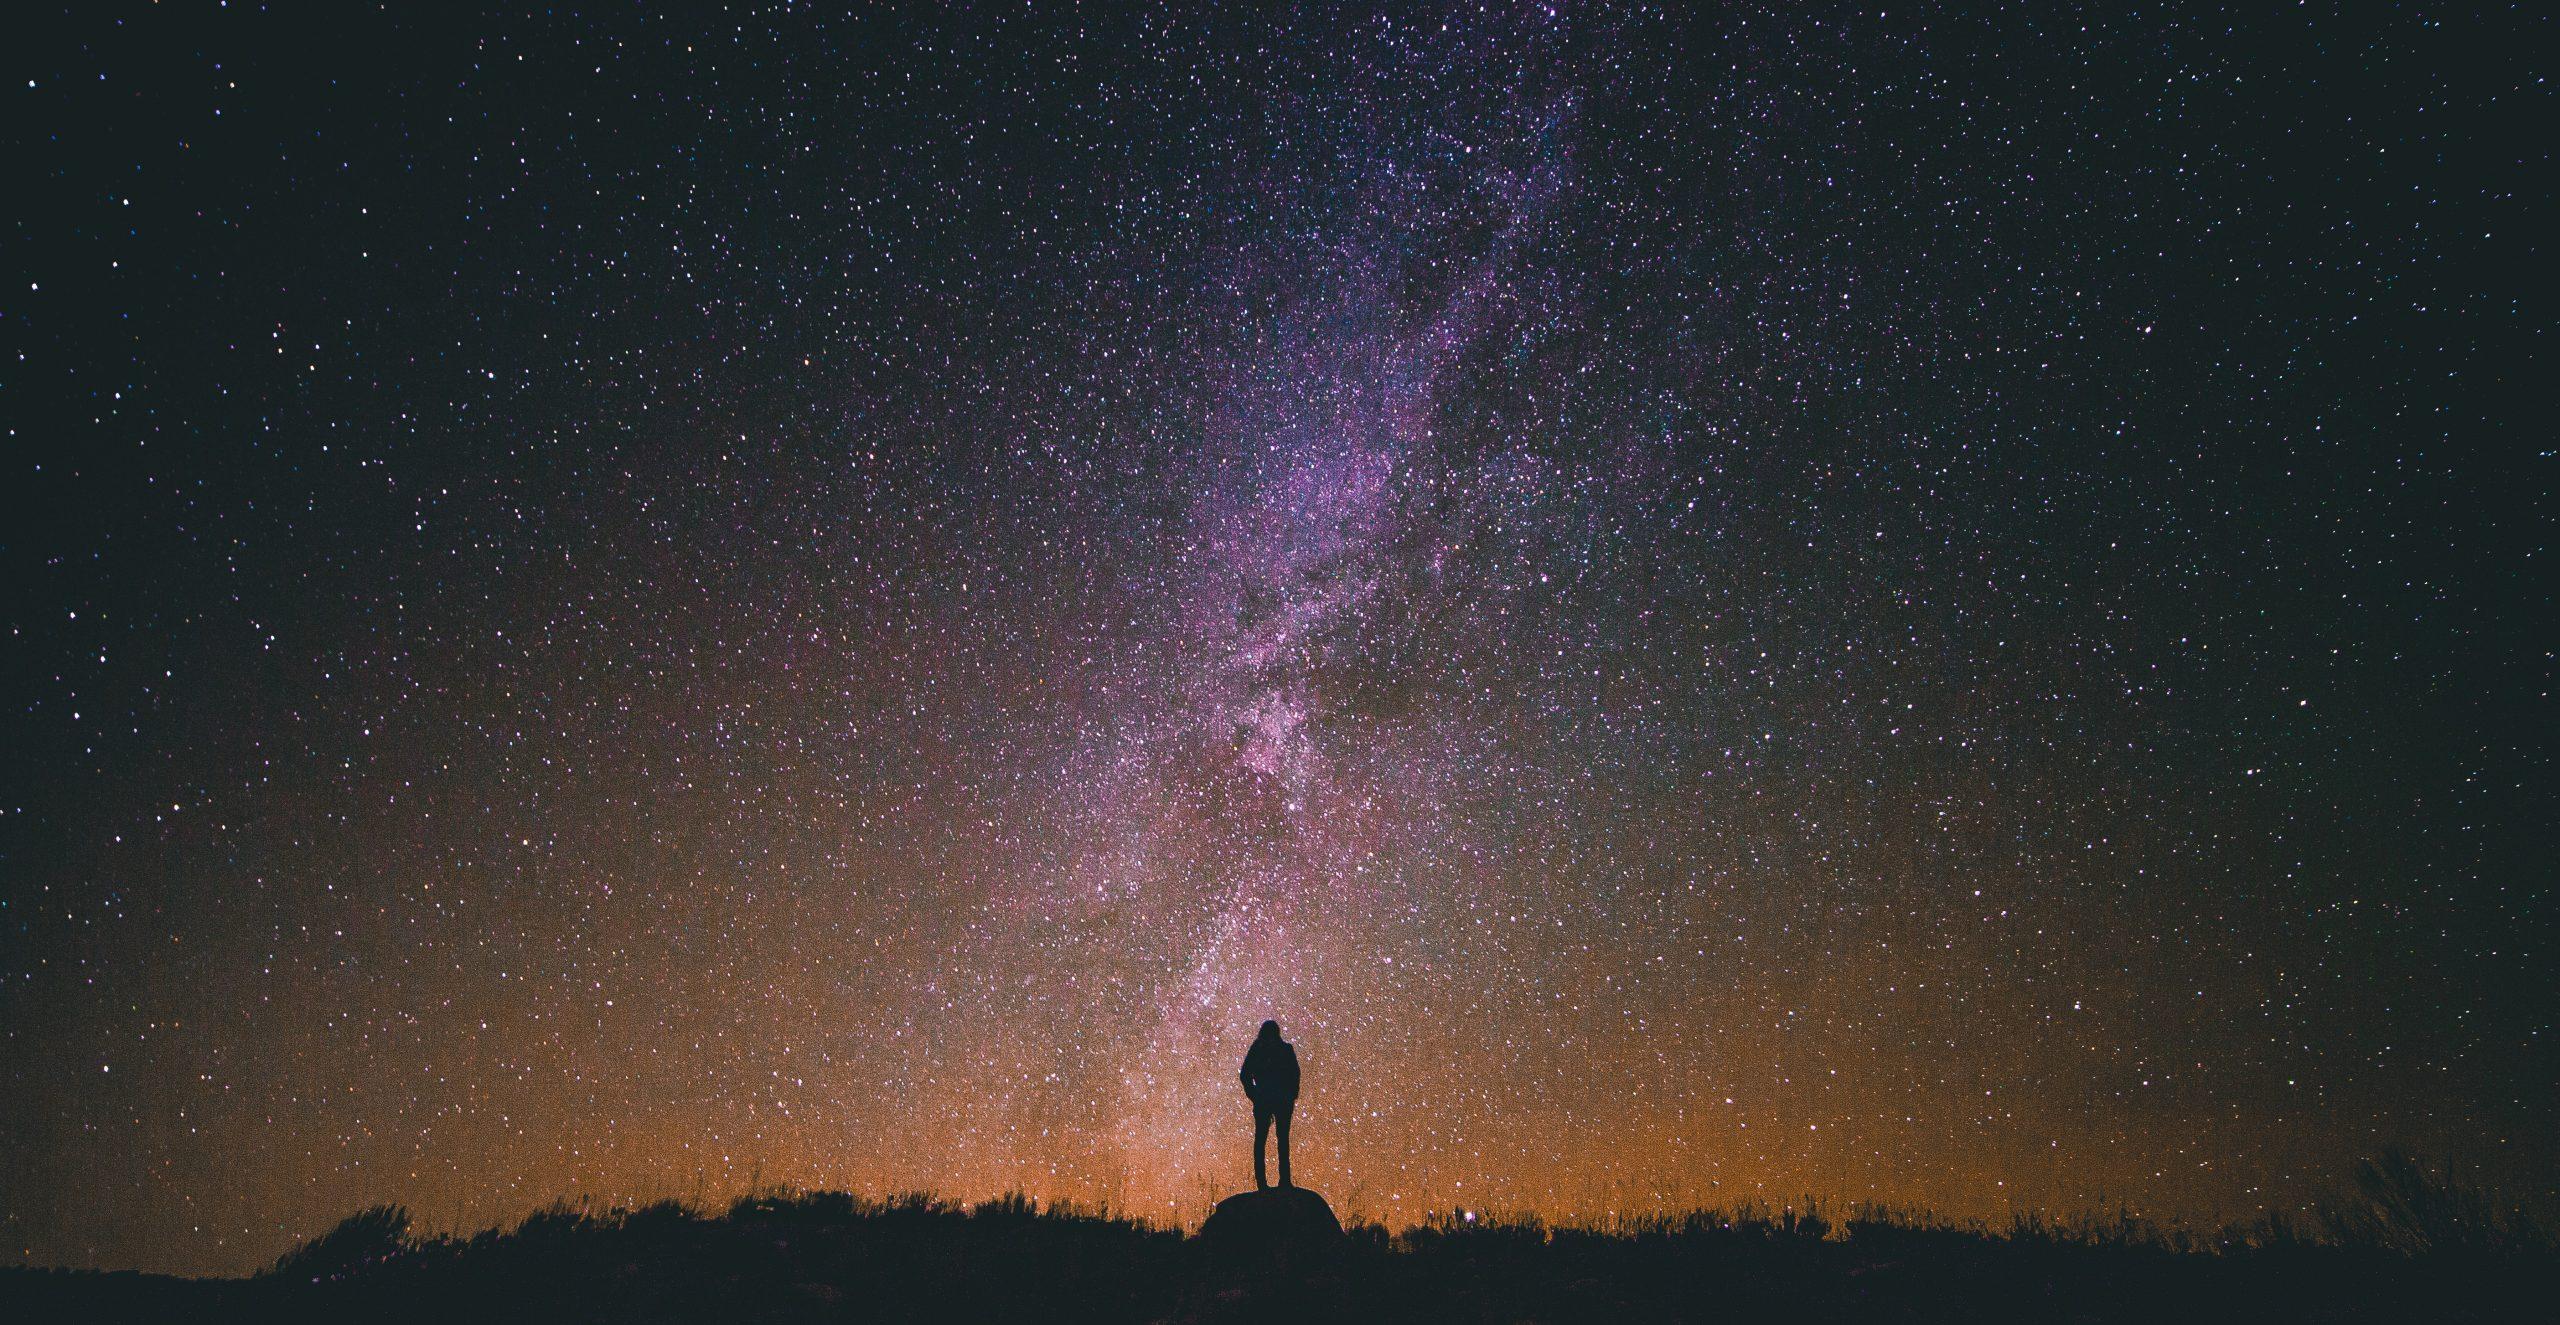 Man standing under the stars